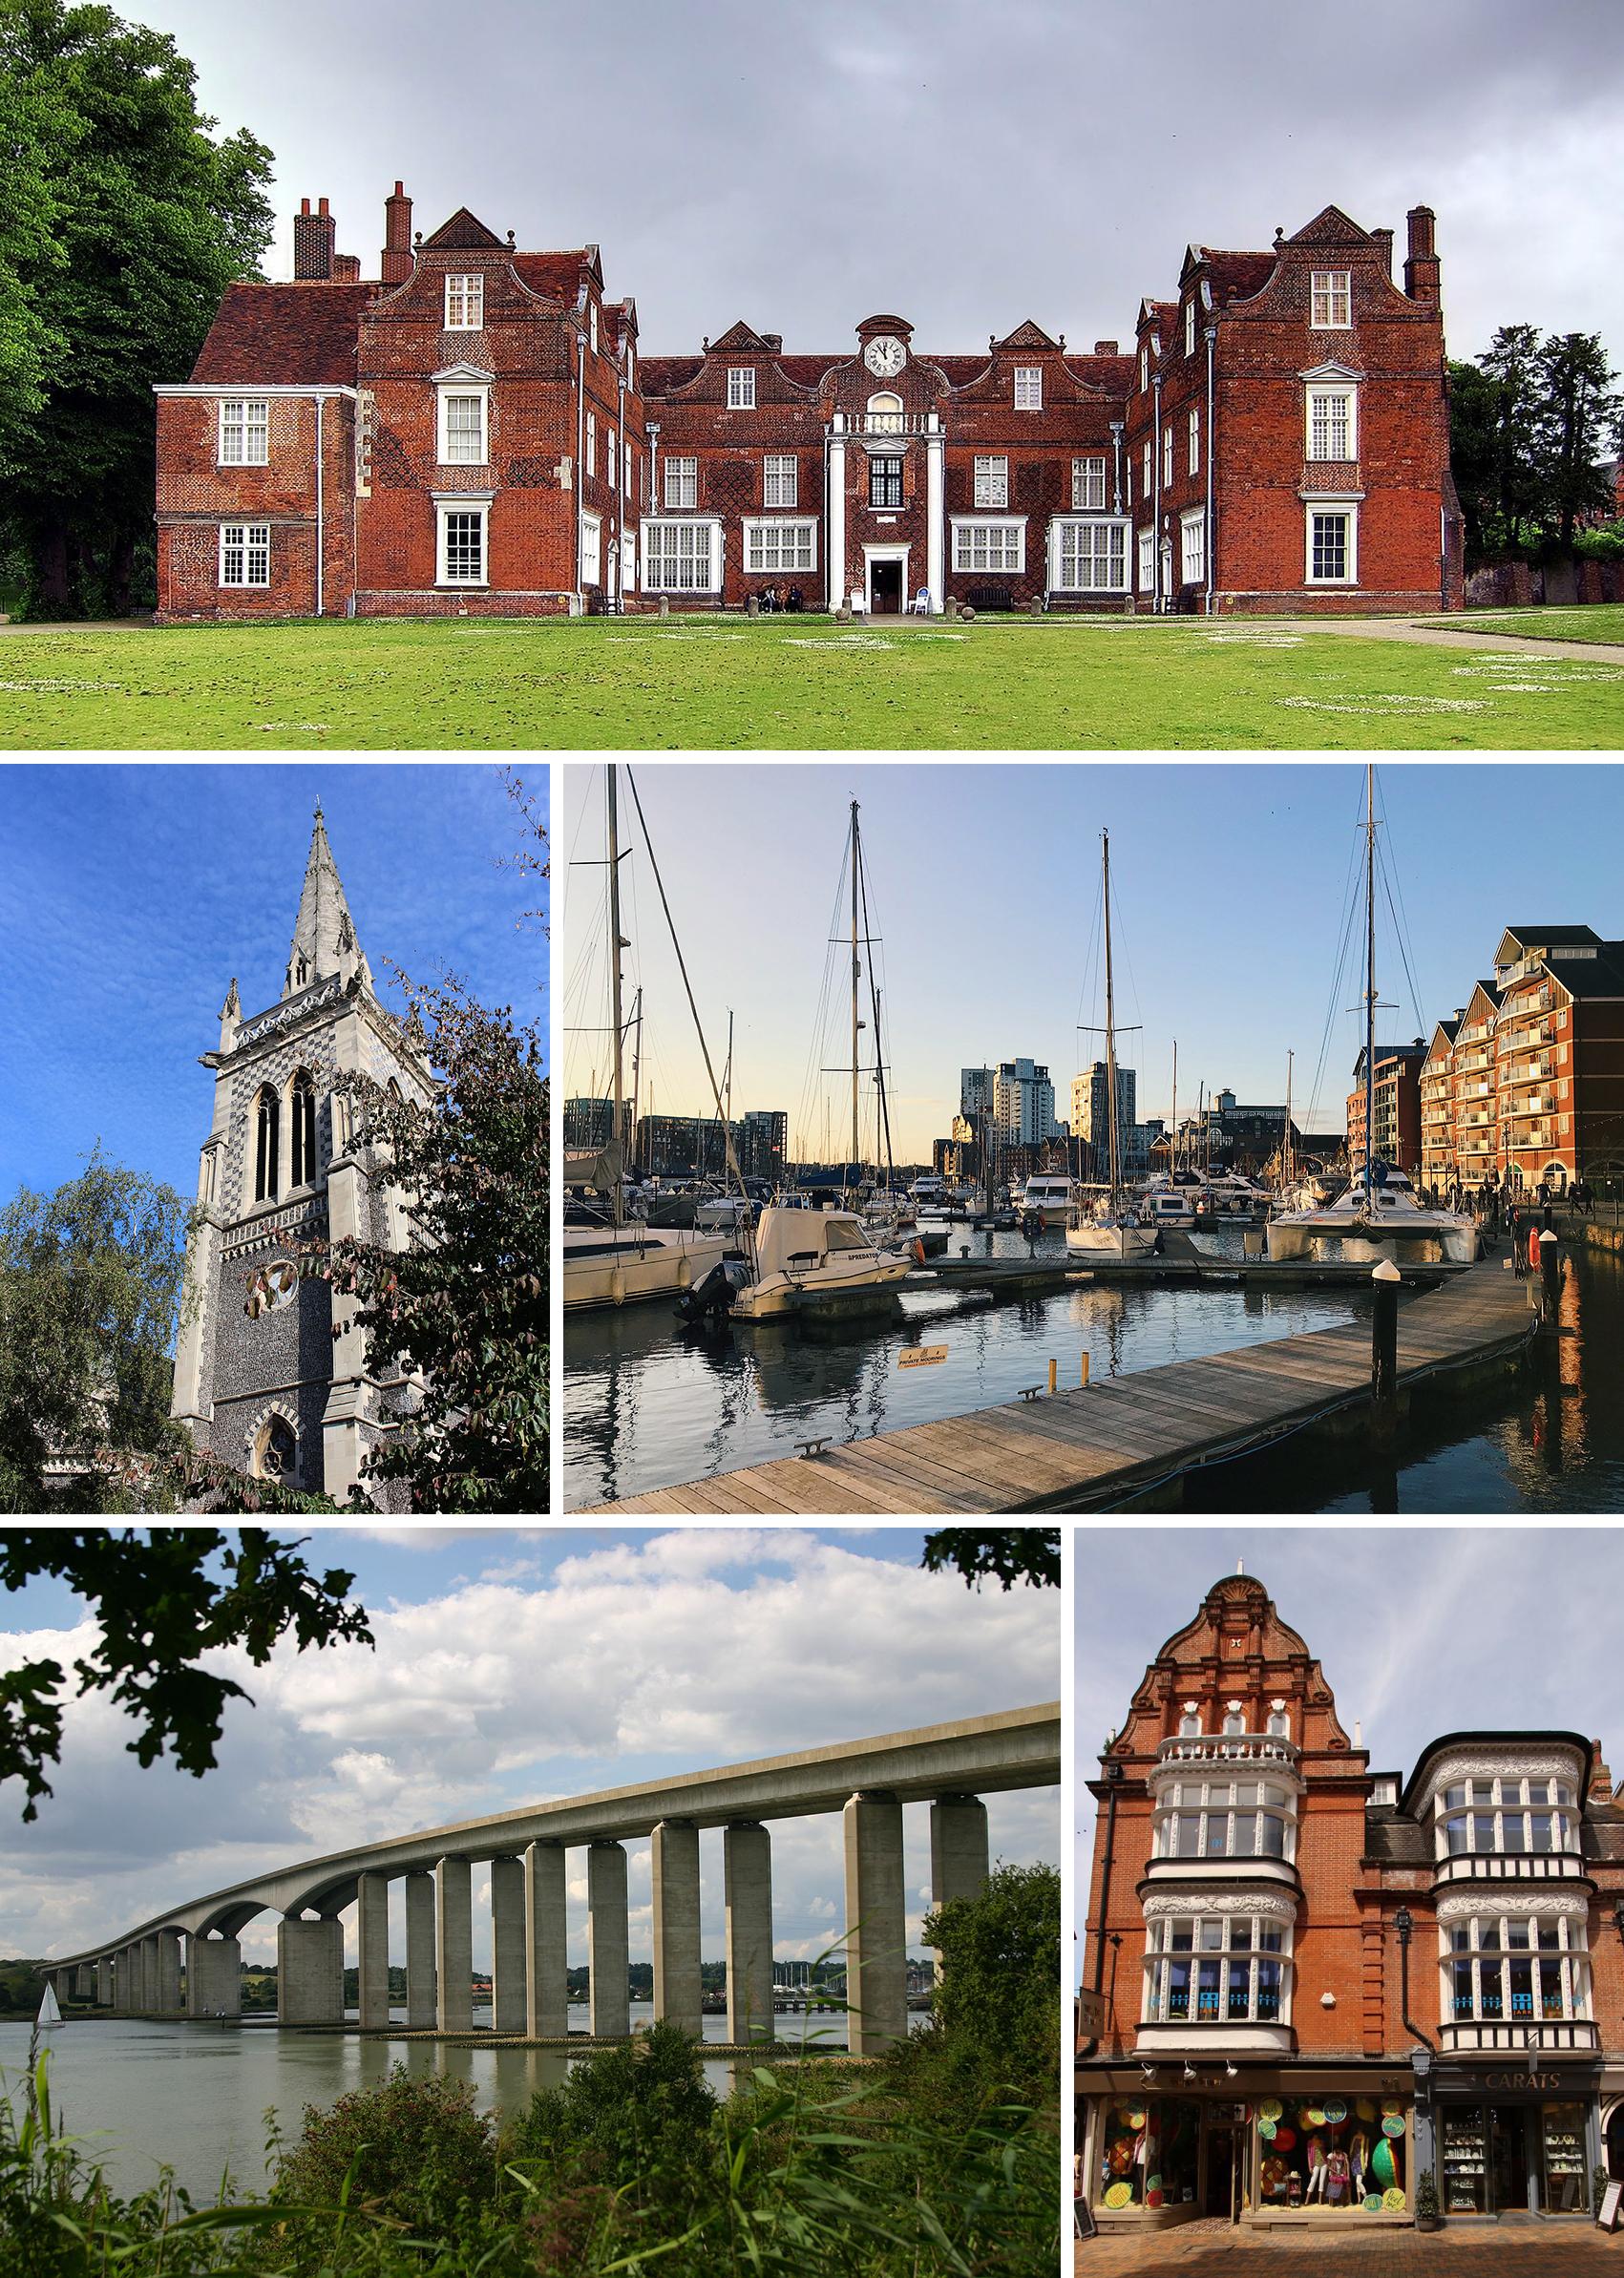 Montage of Ipswich highlights